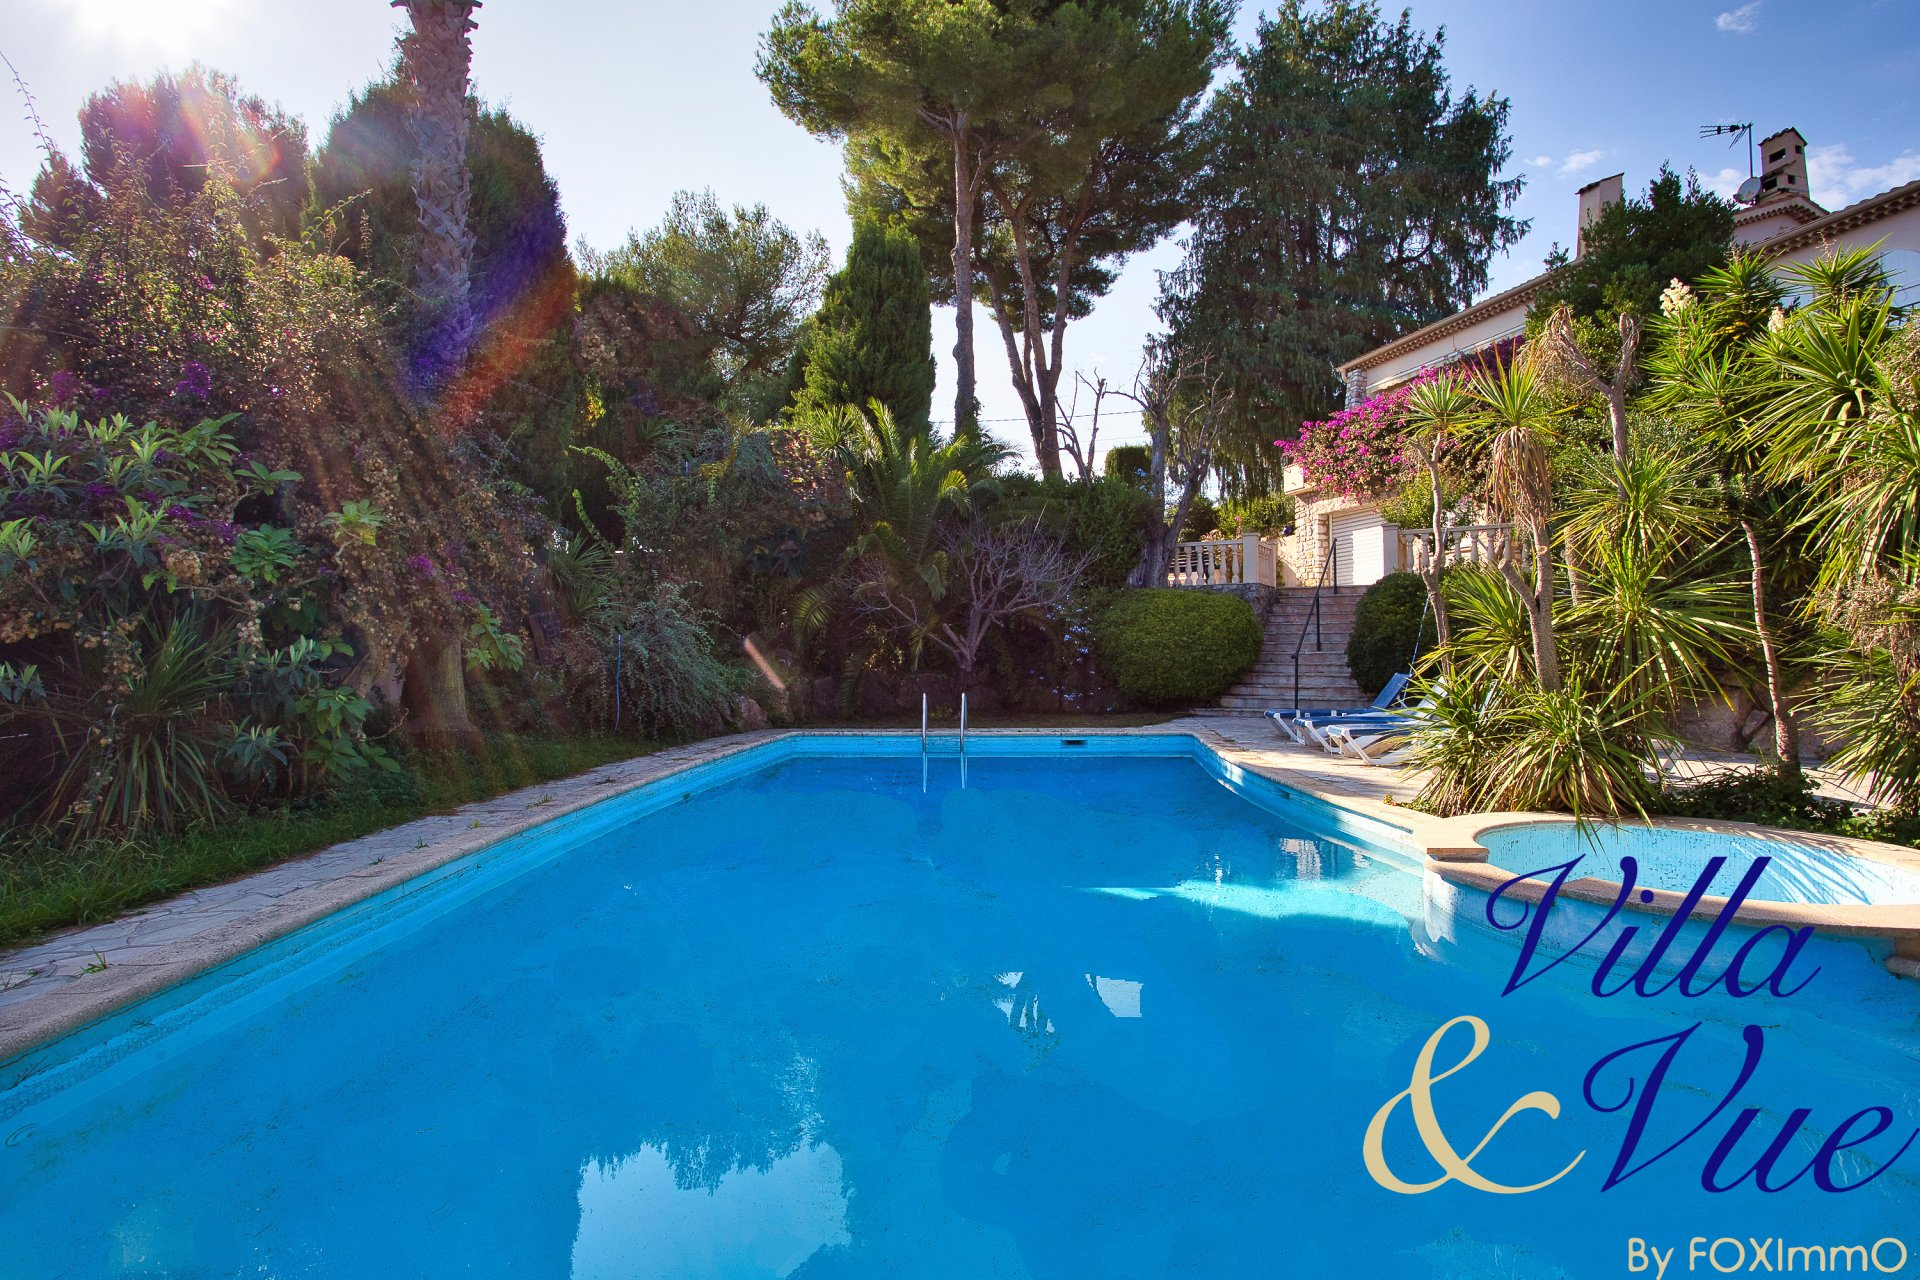 Sur la cote d'azur, Antibes, villa 6 P , aperçu  mer, piscine, terrain plat, garage